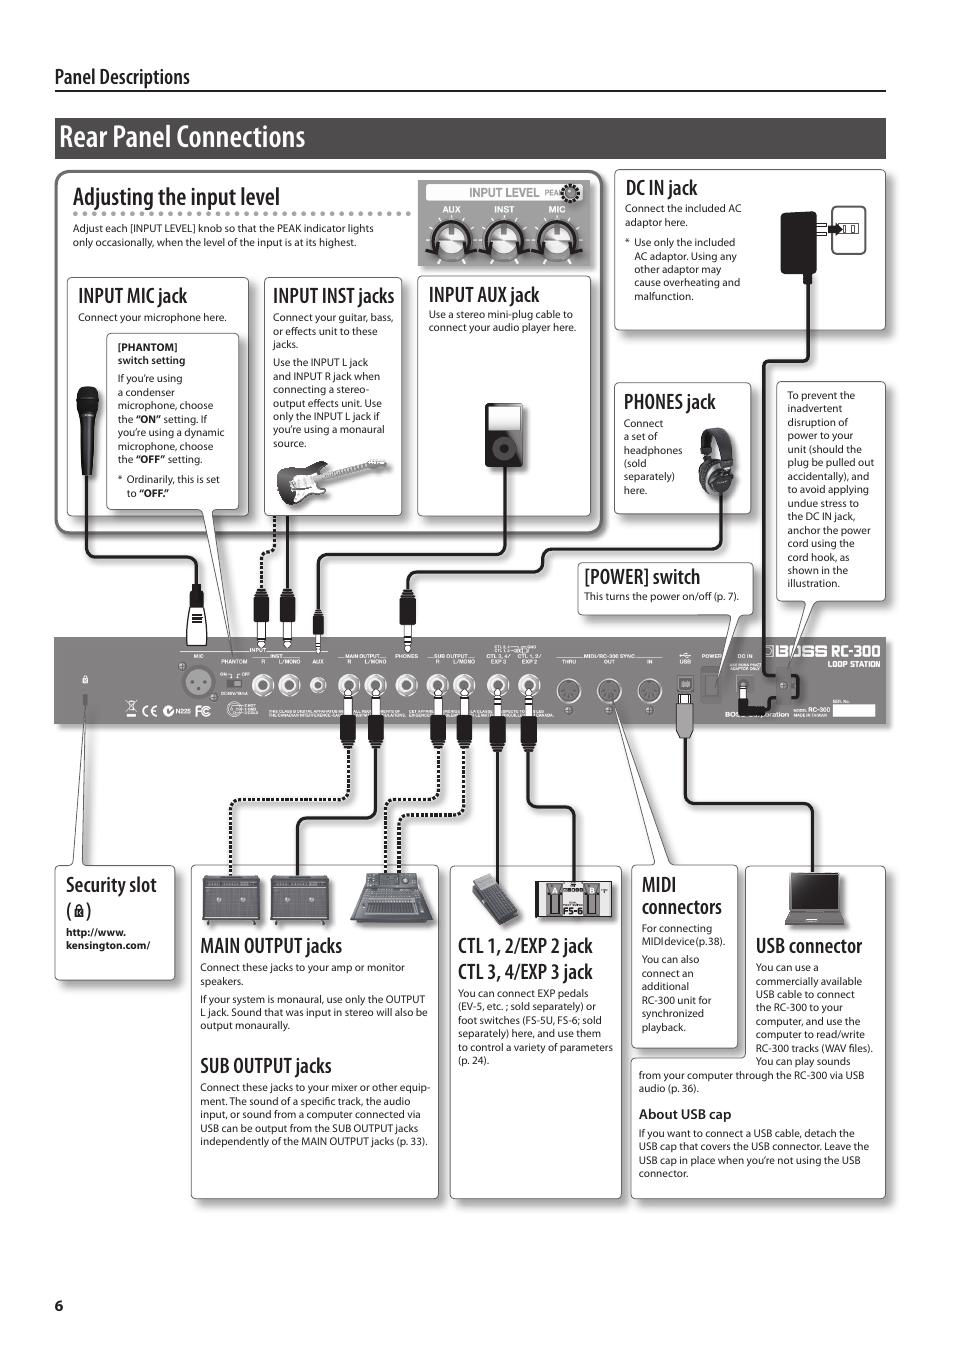 Rear Panel Connections Adjusting The Input Level Nikon D40 Usb Cable Schematic Descriptions Security Slot